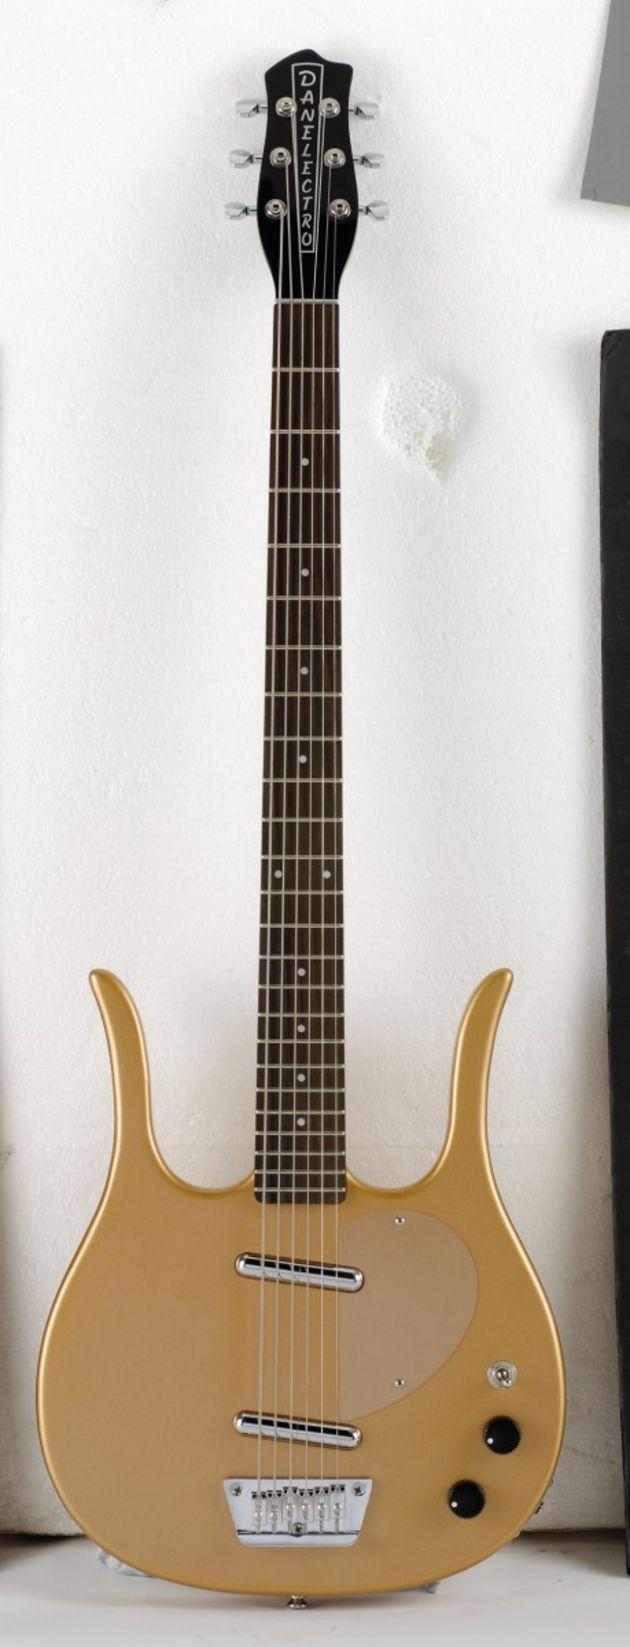 danelectro longhorn baritone guitar reviews musicradar. Black Bedroom Furniture Sets. Home Design Ideas